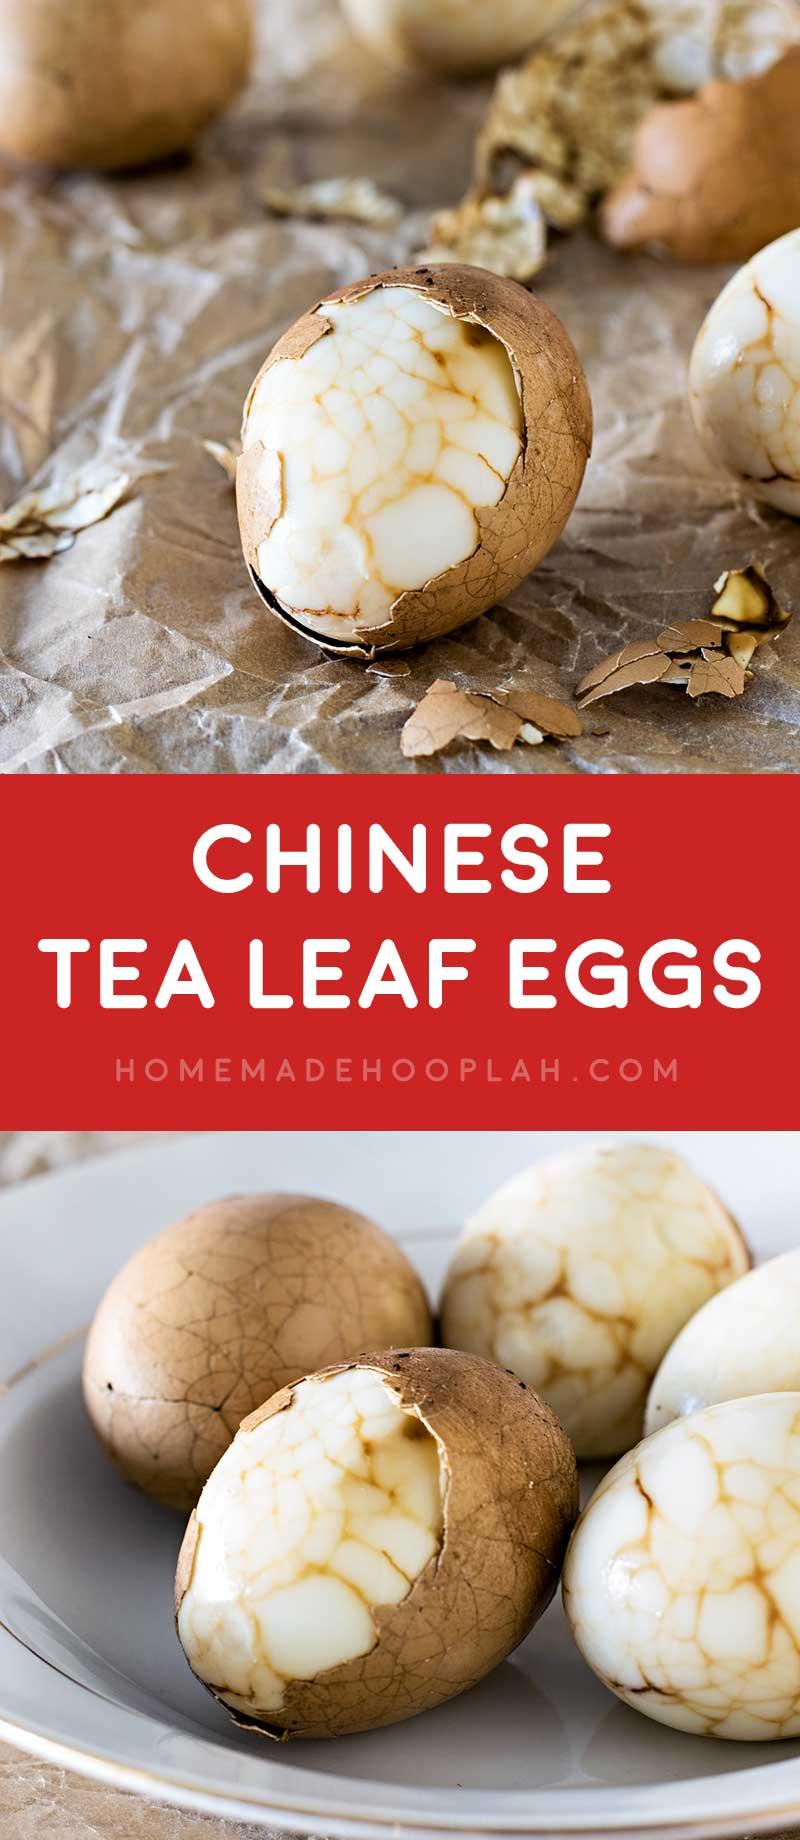 Chinese Tea Leaf Eggs! Celebrate Chinese New Year with traditional Chinese tea leaf eggs, spiked with a touch of orange for good fortune for the next year! #KikkomanCNY #spon @kikkomanusa | HomemadeHooplah.com